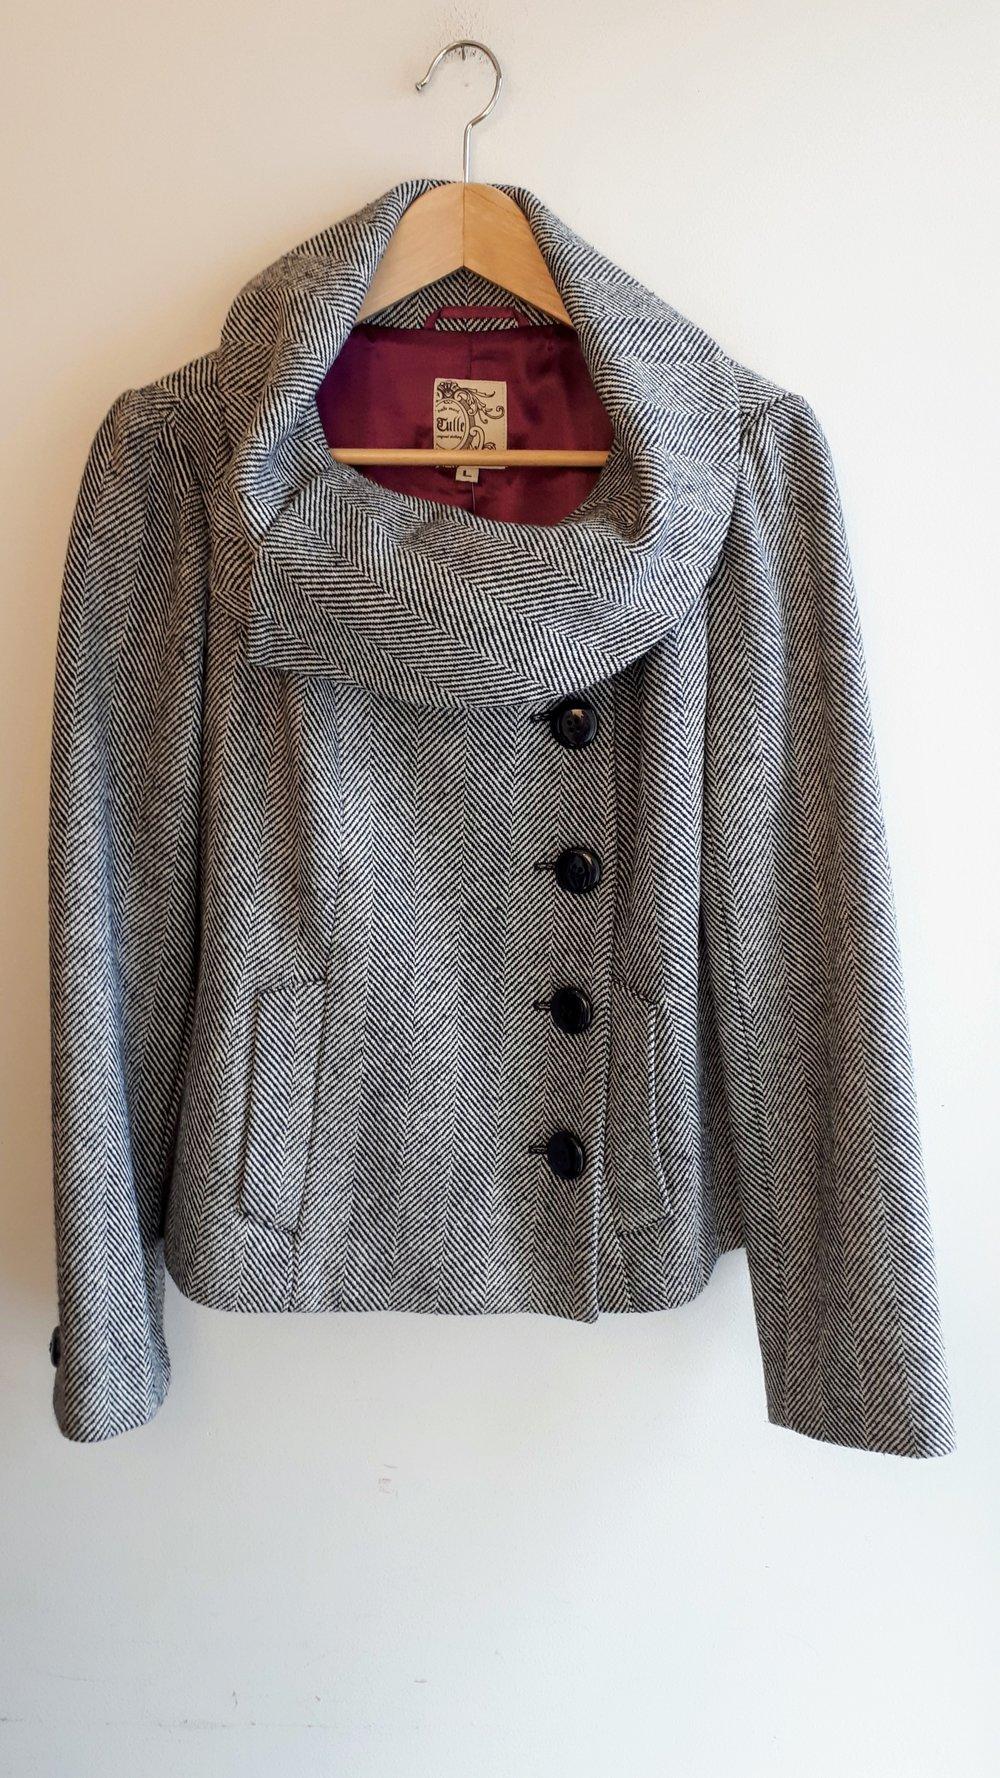 Tulle coat; Size L, $62